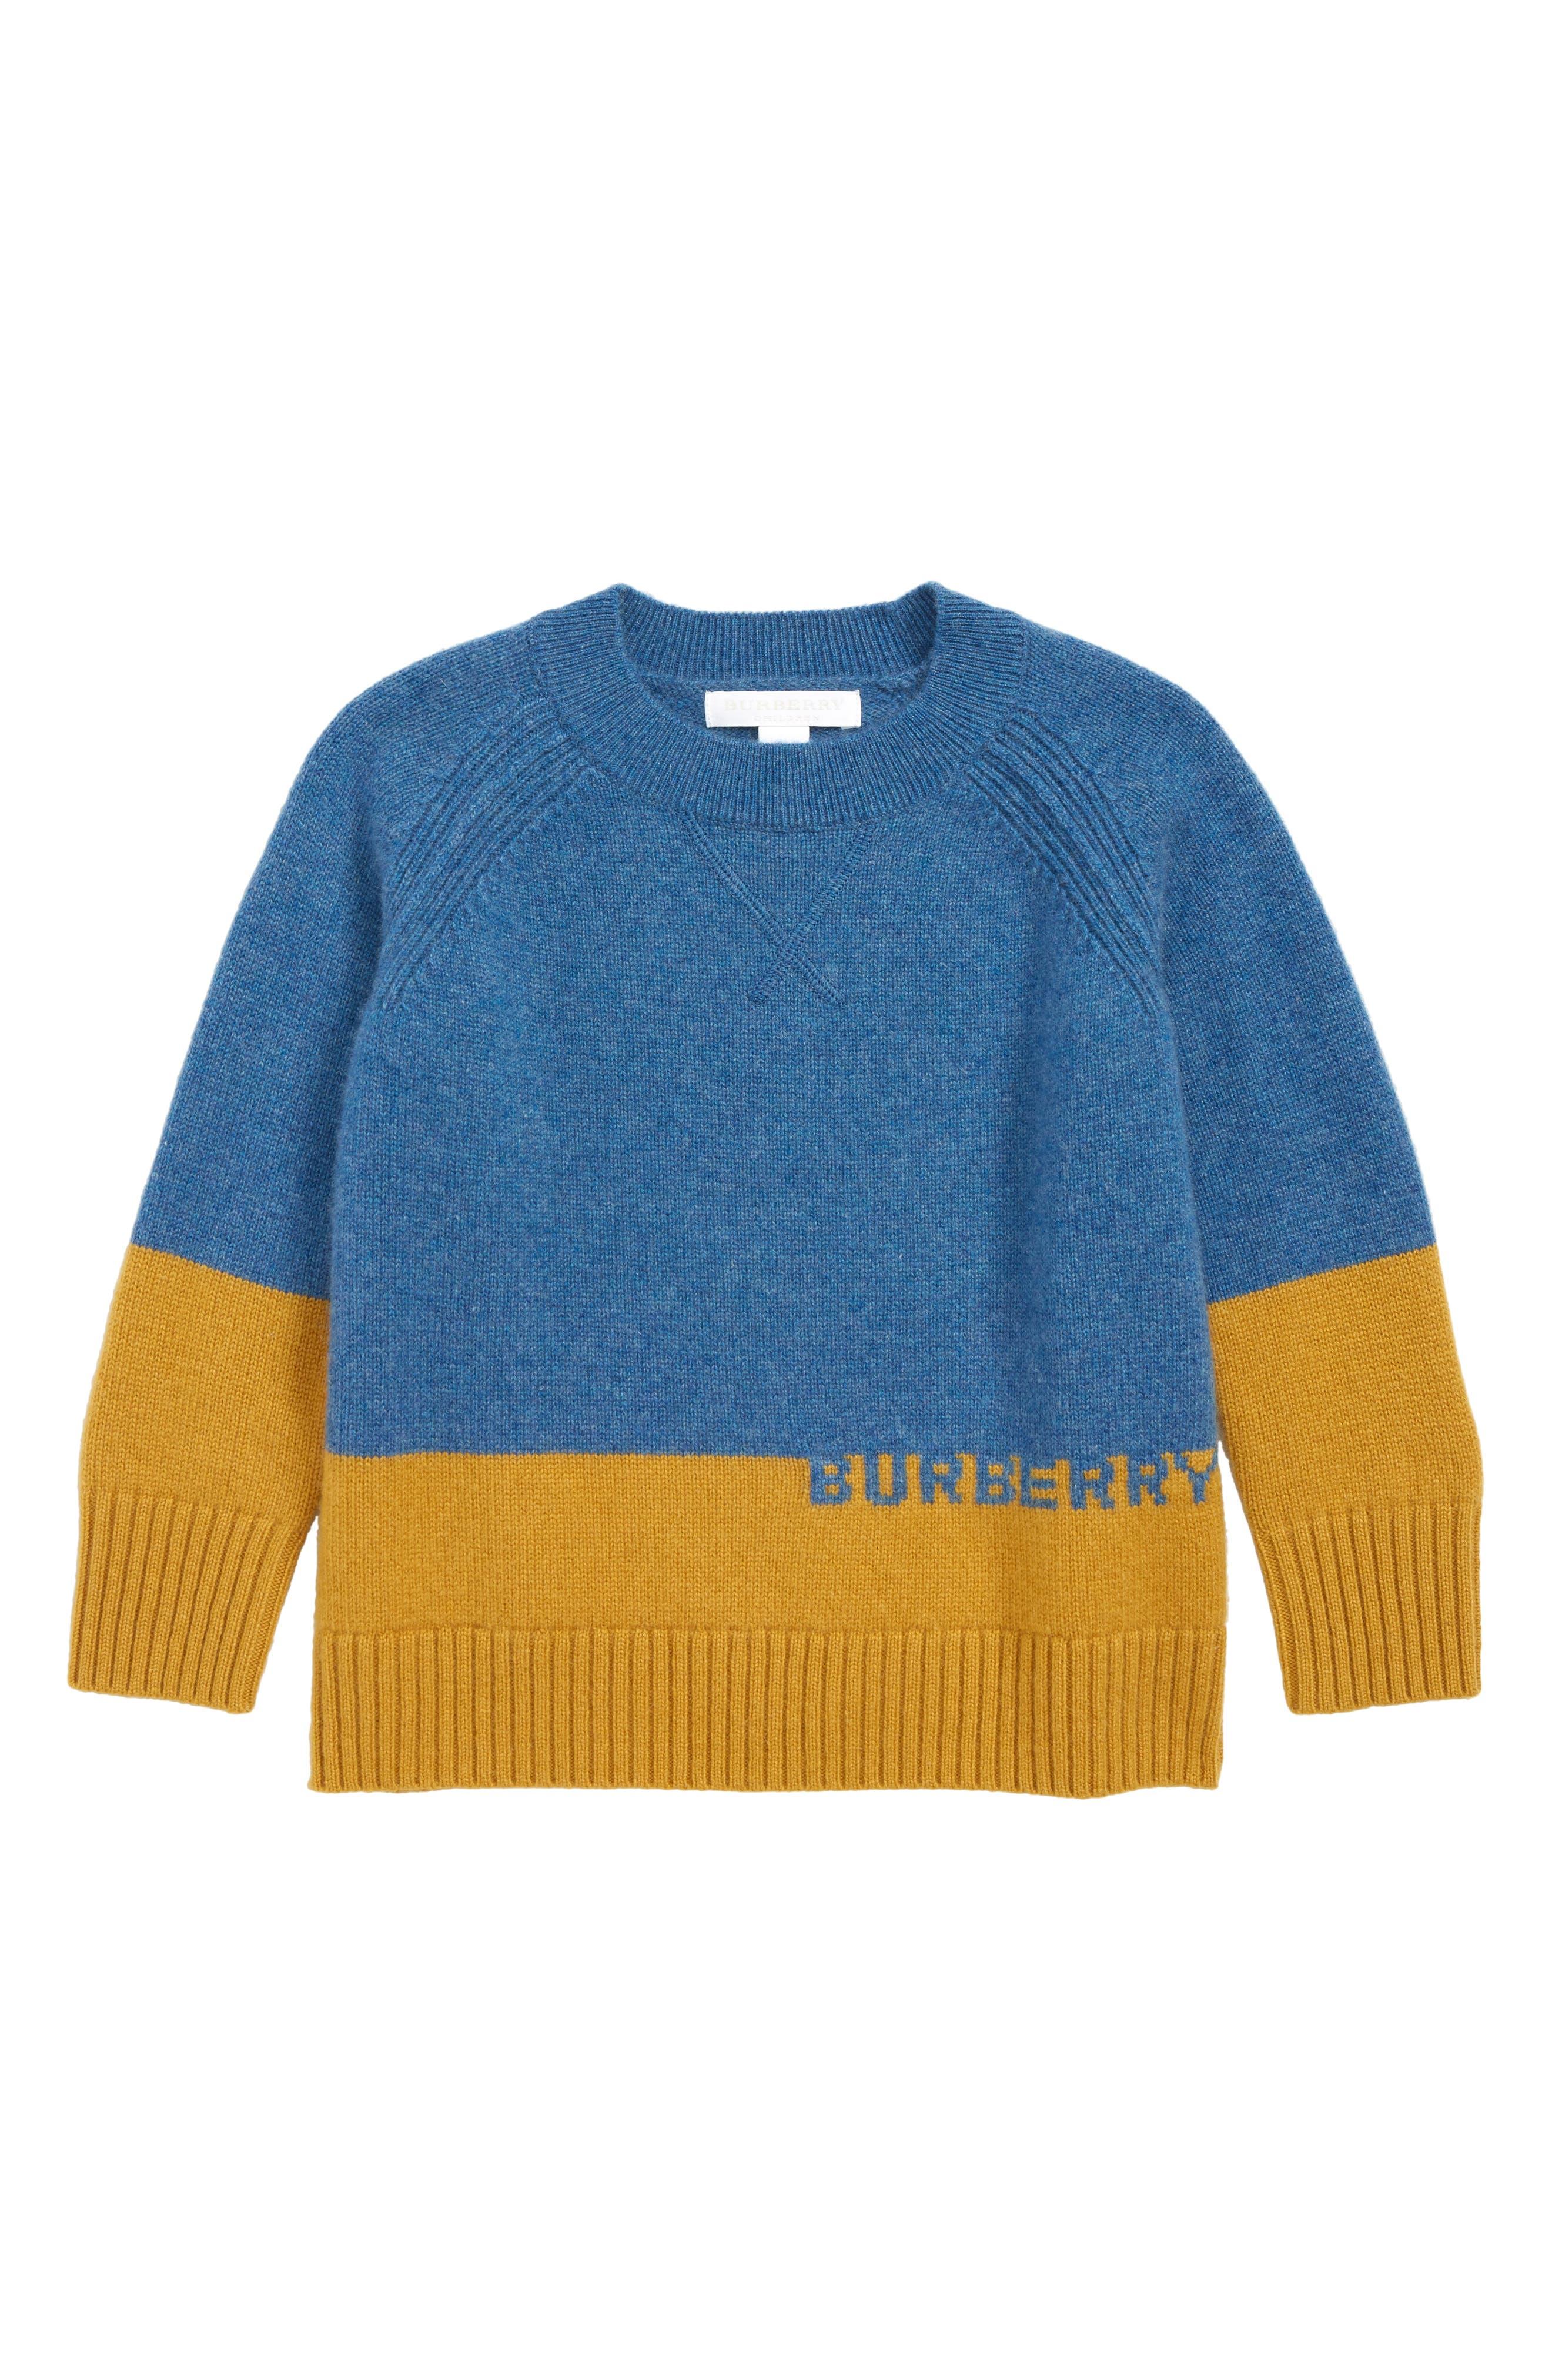 Alister Cashmere Sweater,                             Main thumbnail 1, color,                             DUSTY BLUE MELANGE